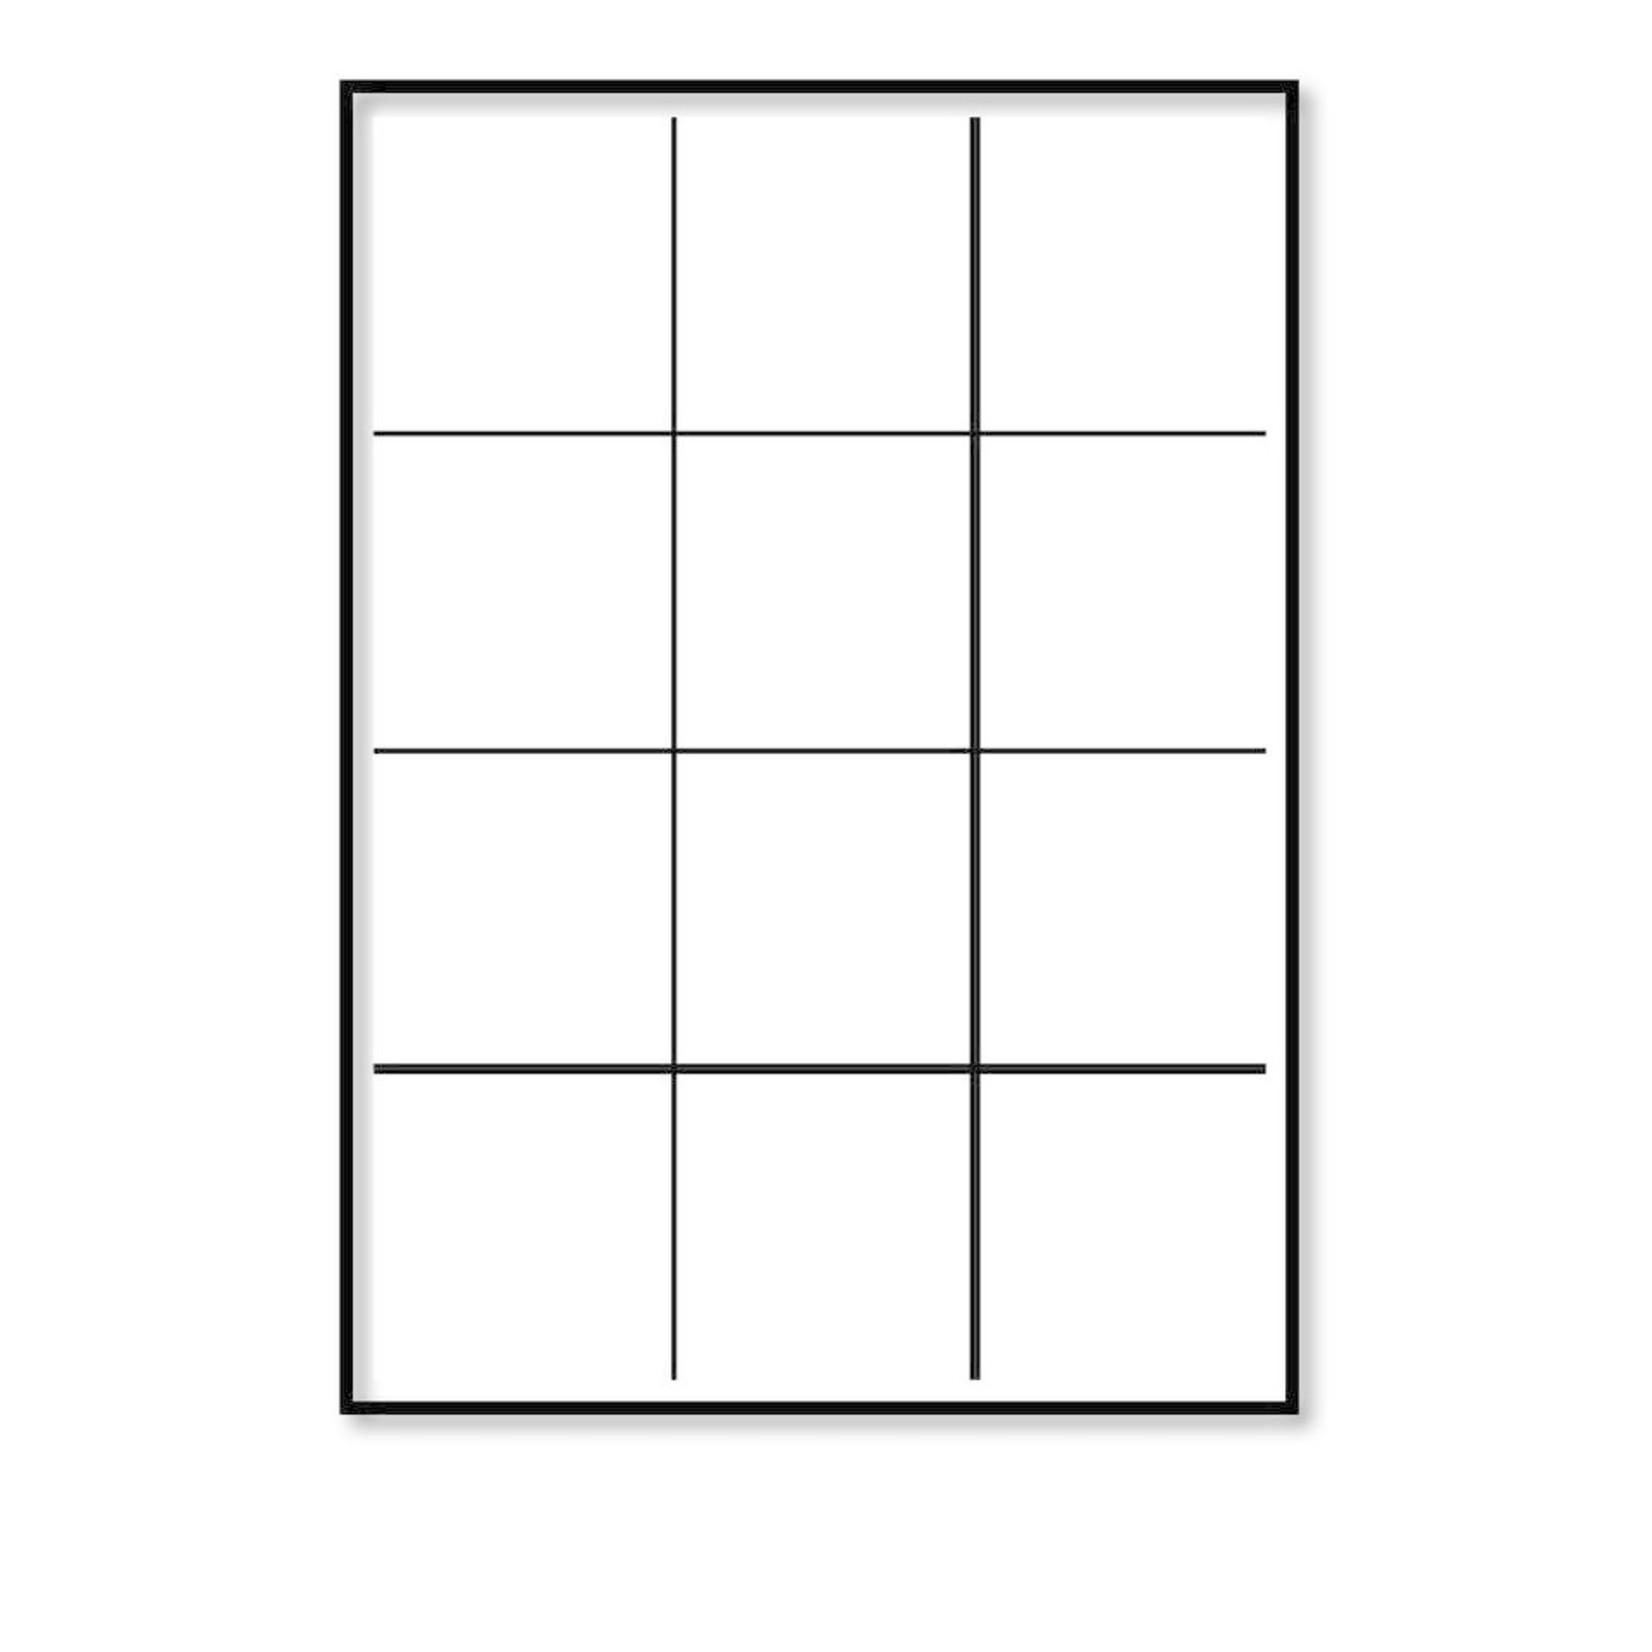 Pixelposter - Raster (A5)